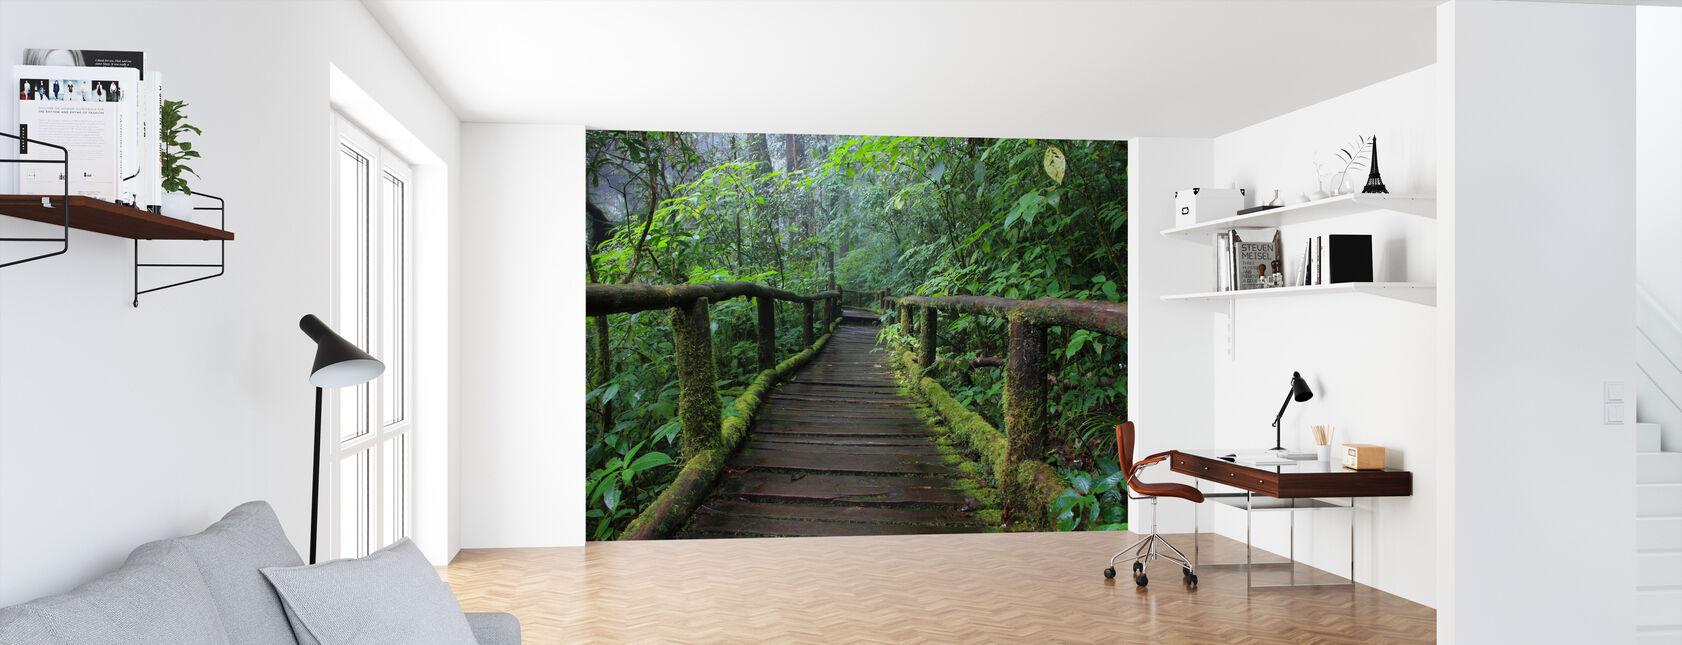 Beautiful Bridge in Thailand - Wallpaper - Office